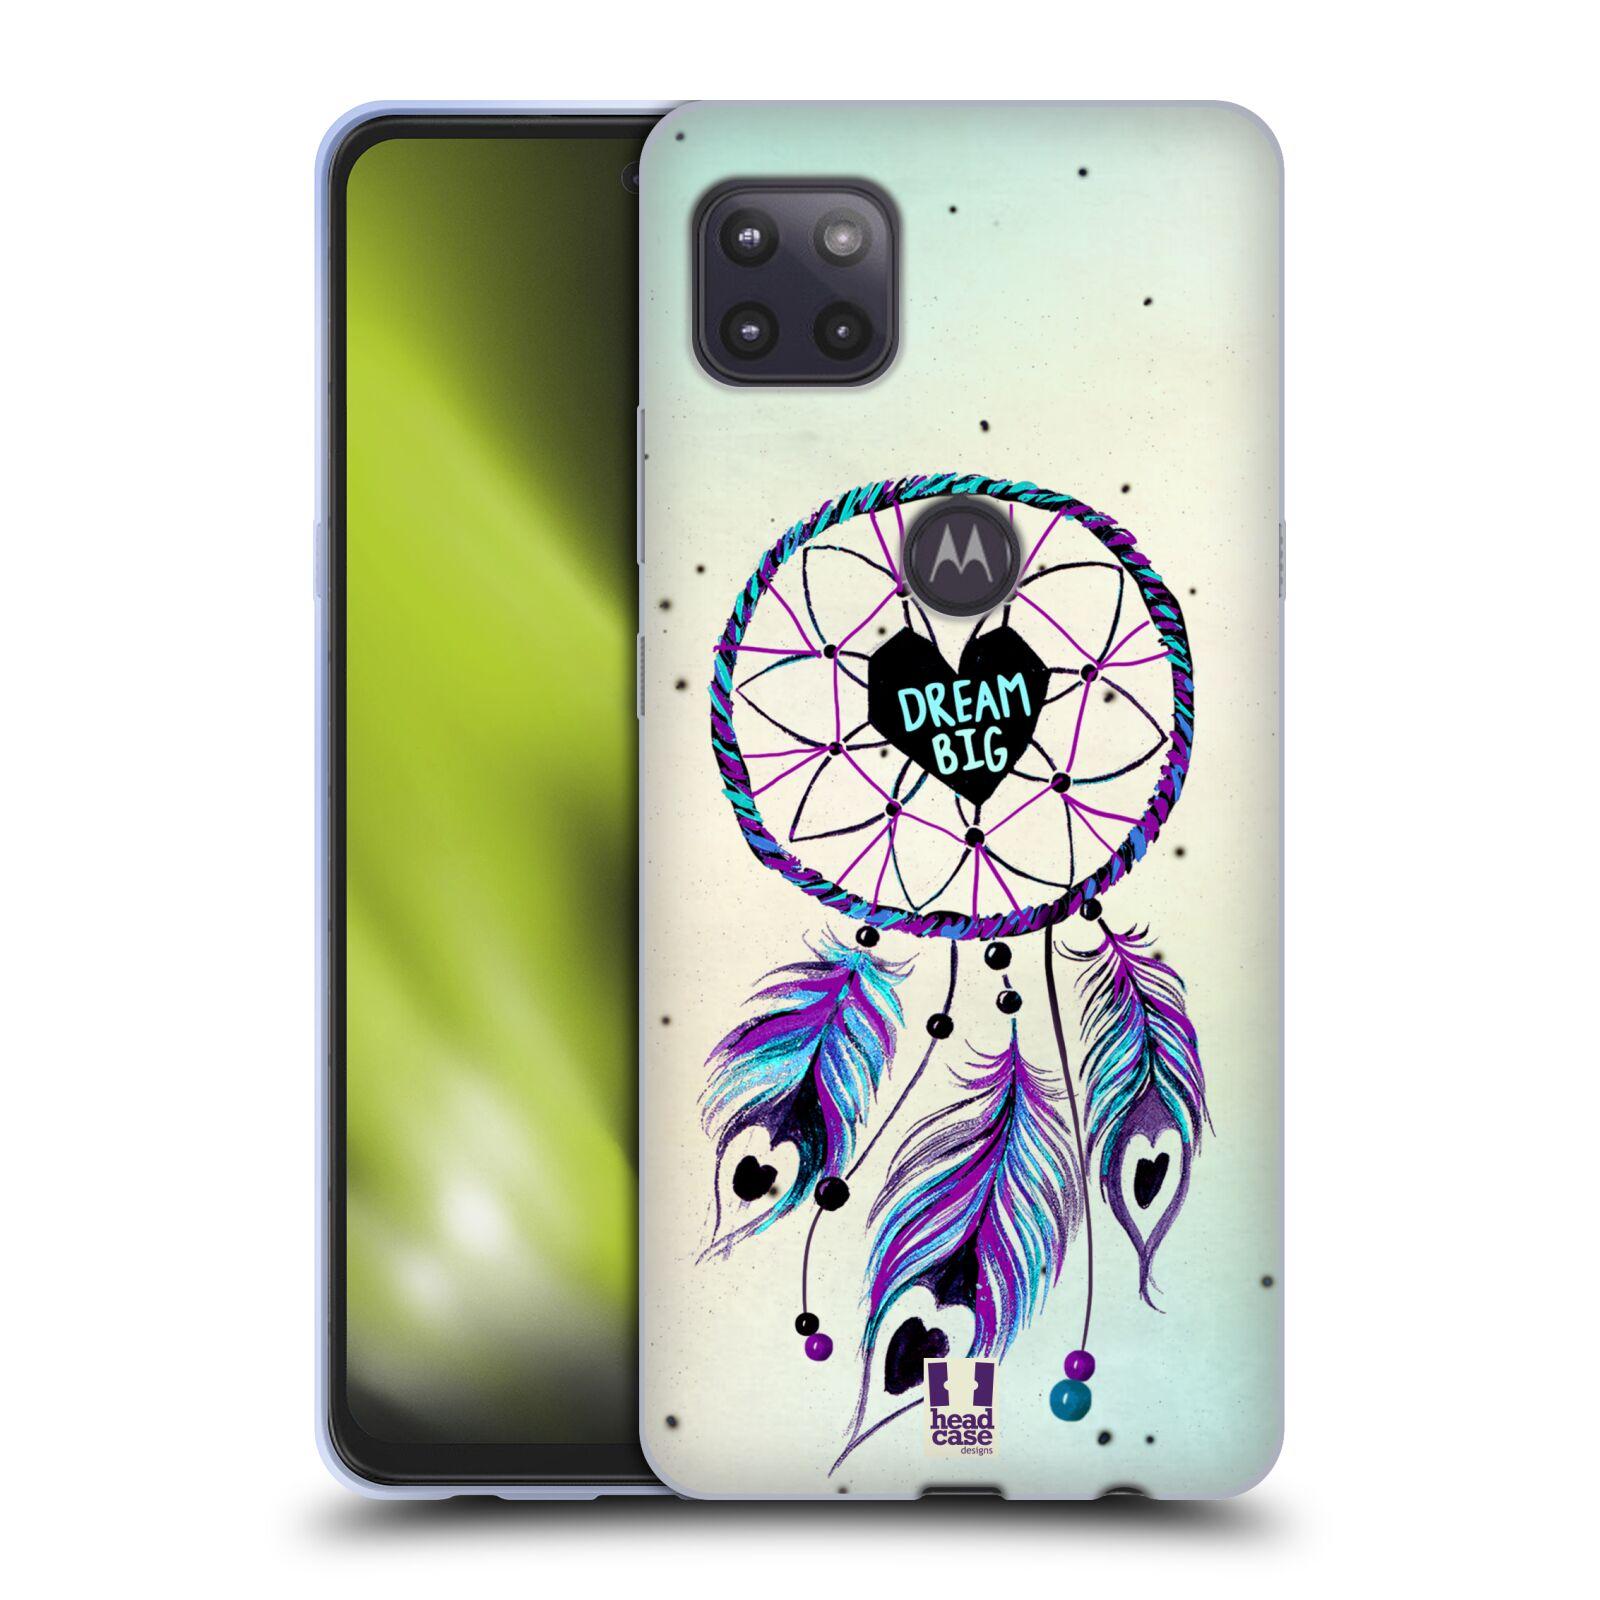 Silikonové pouzdro na mobil Motorola Moto G 5G - Head Case - Lapač Assorted Dream Big Srdce